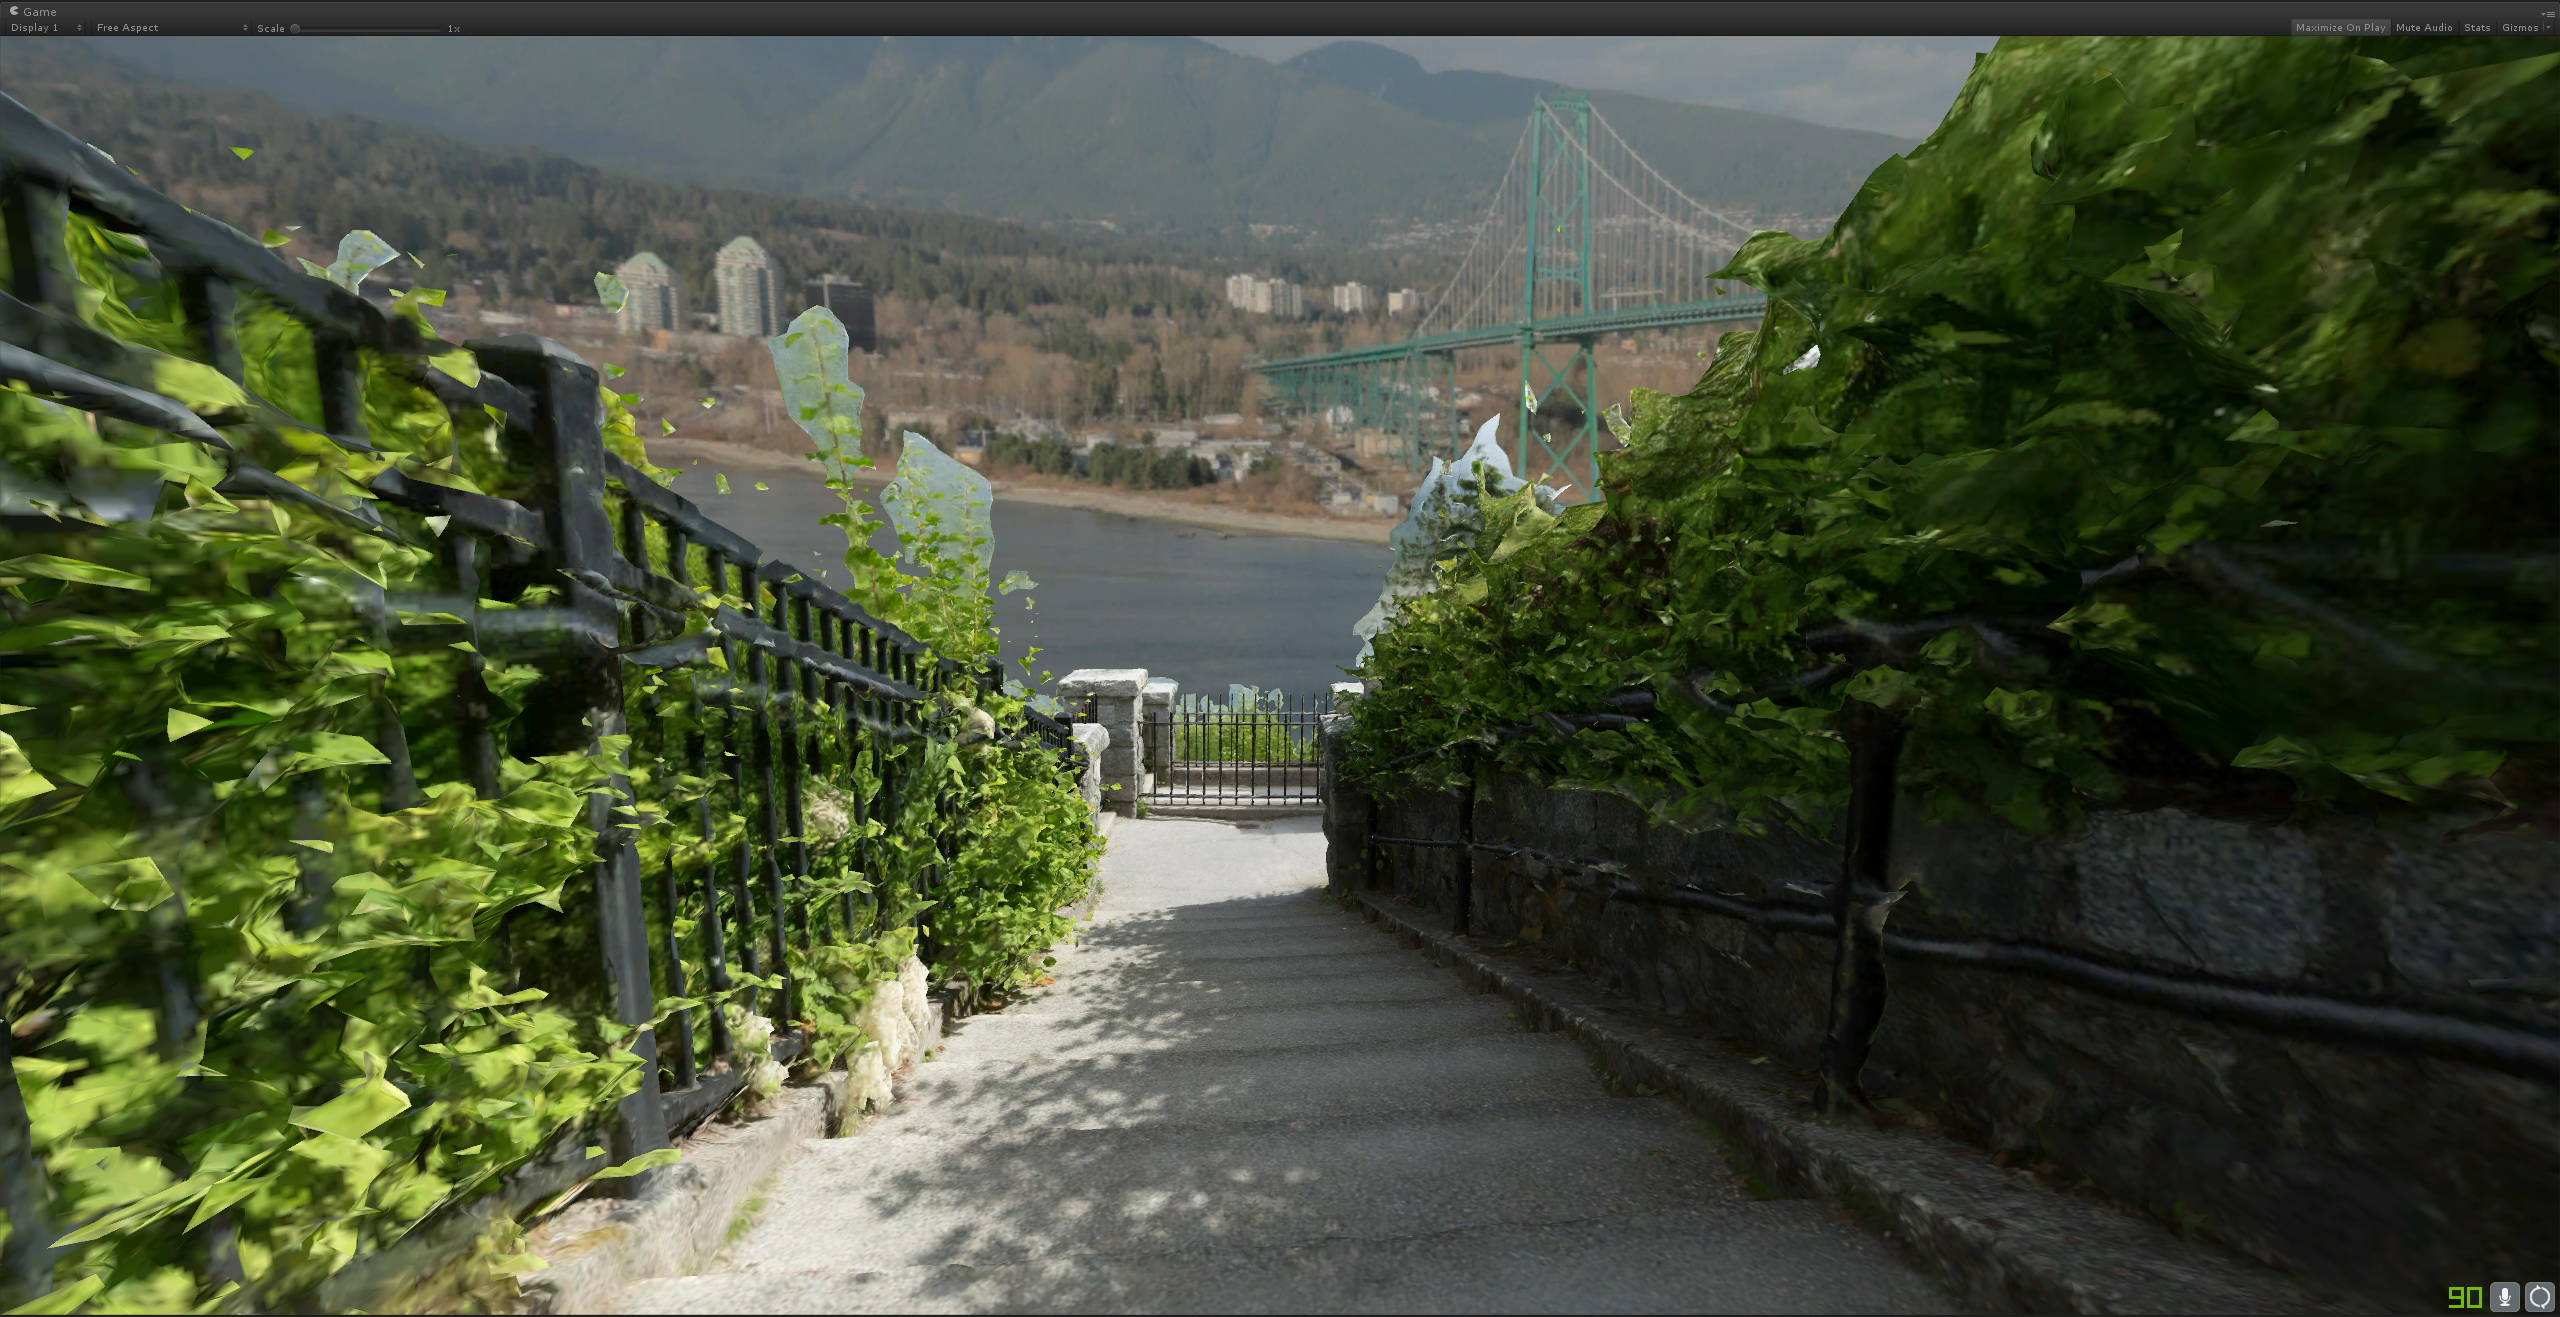 virtual reality field trip photogrammetry